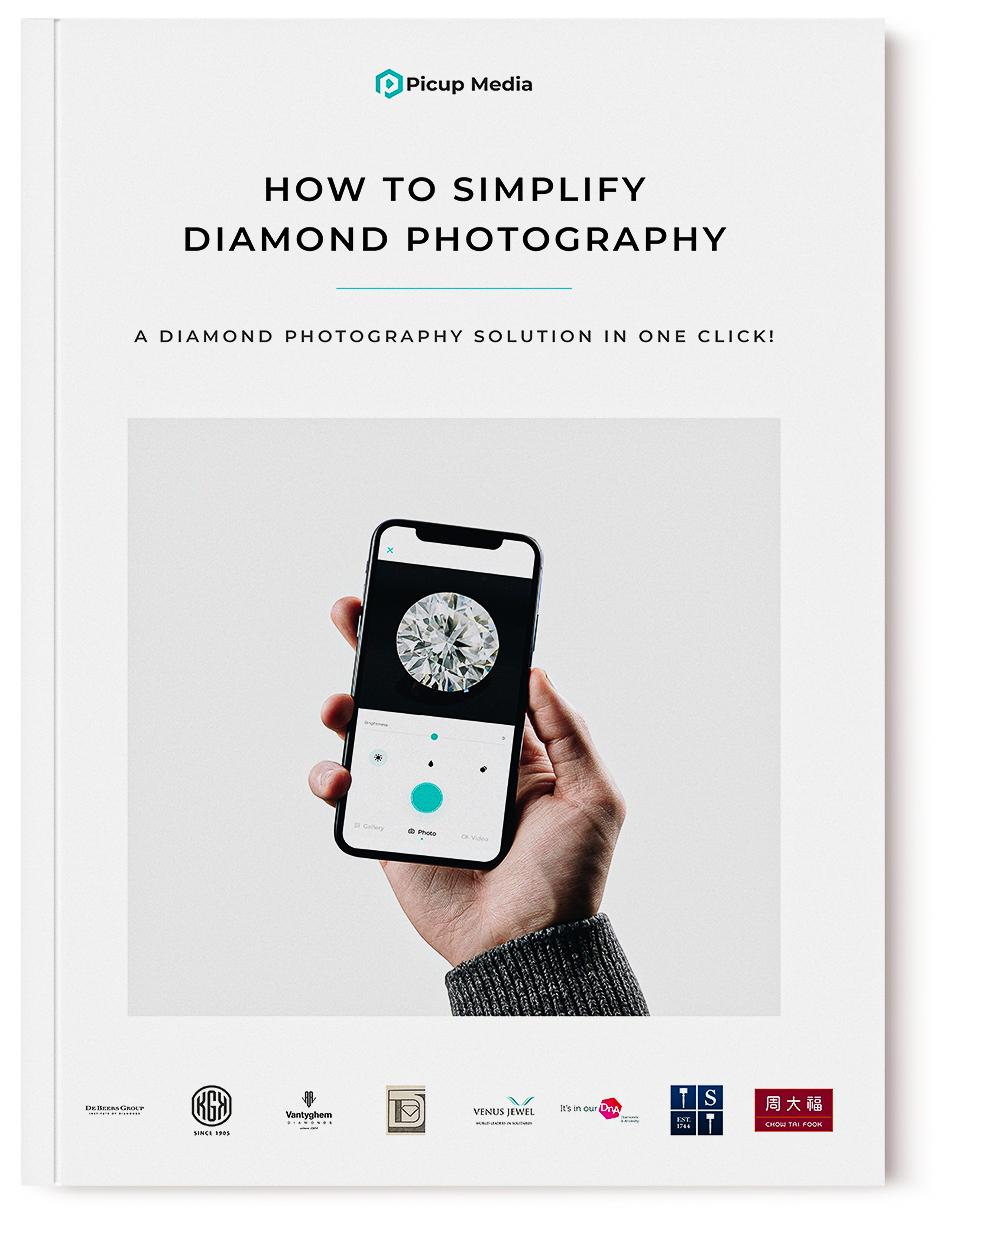 Simplify Diamond photography